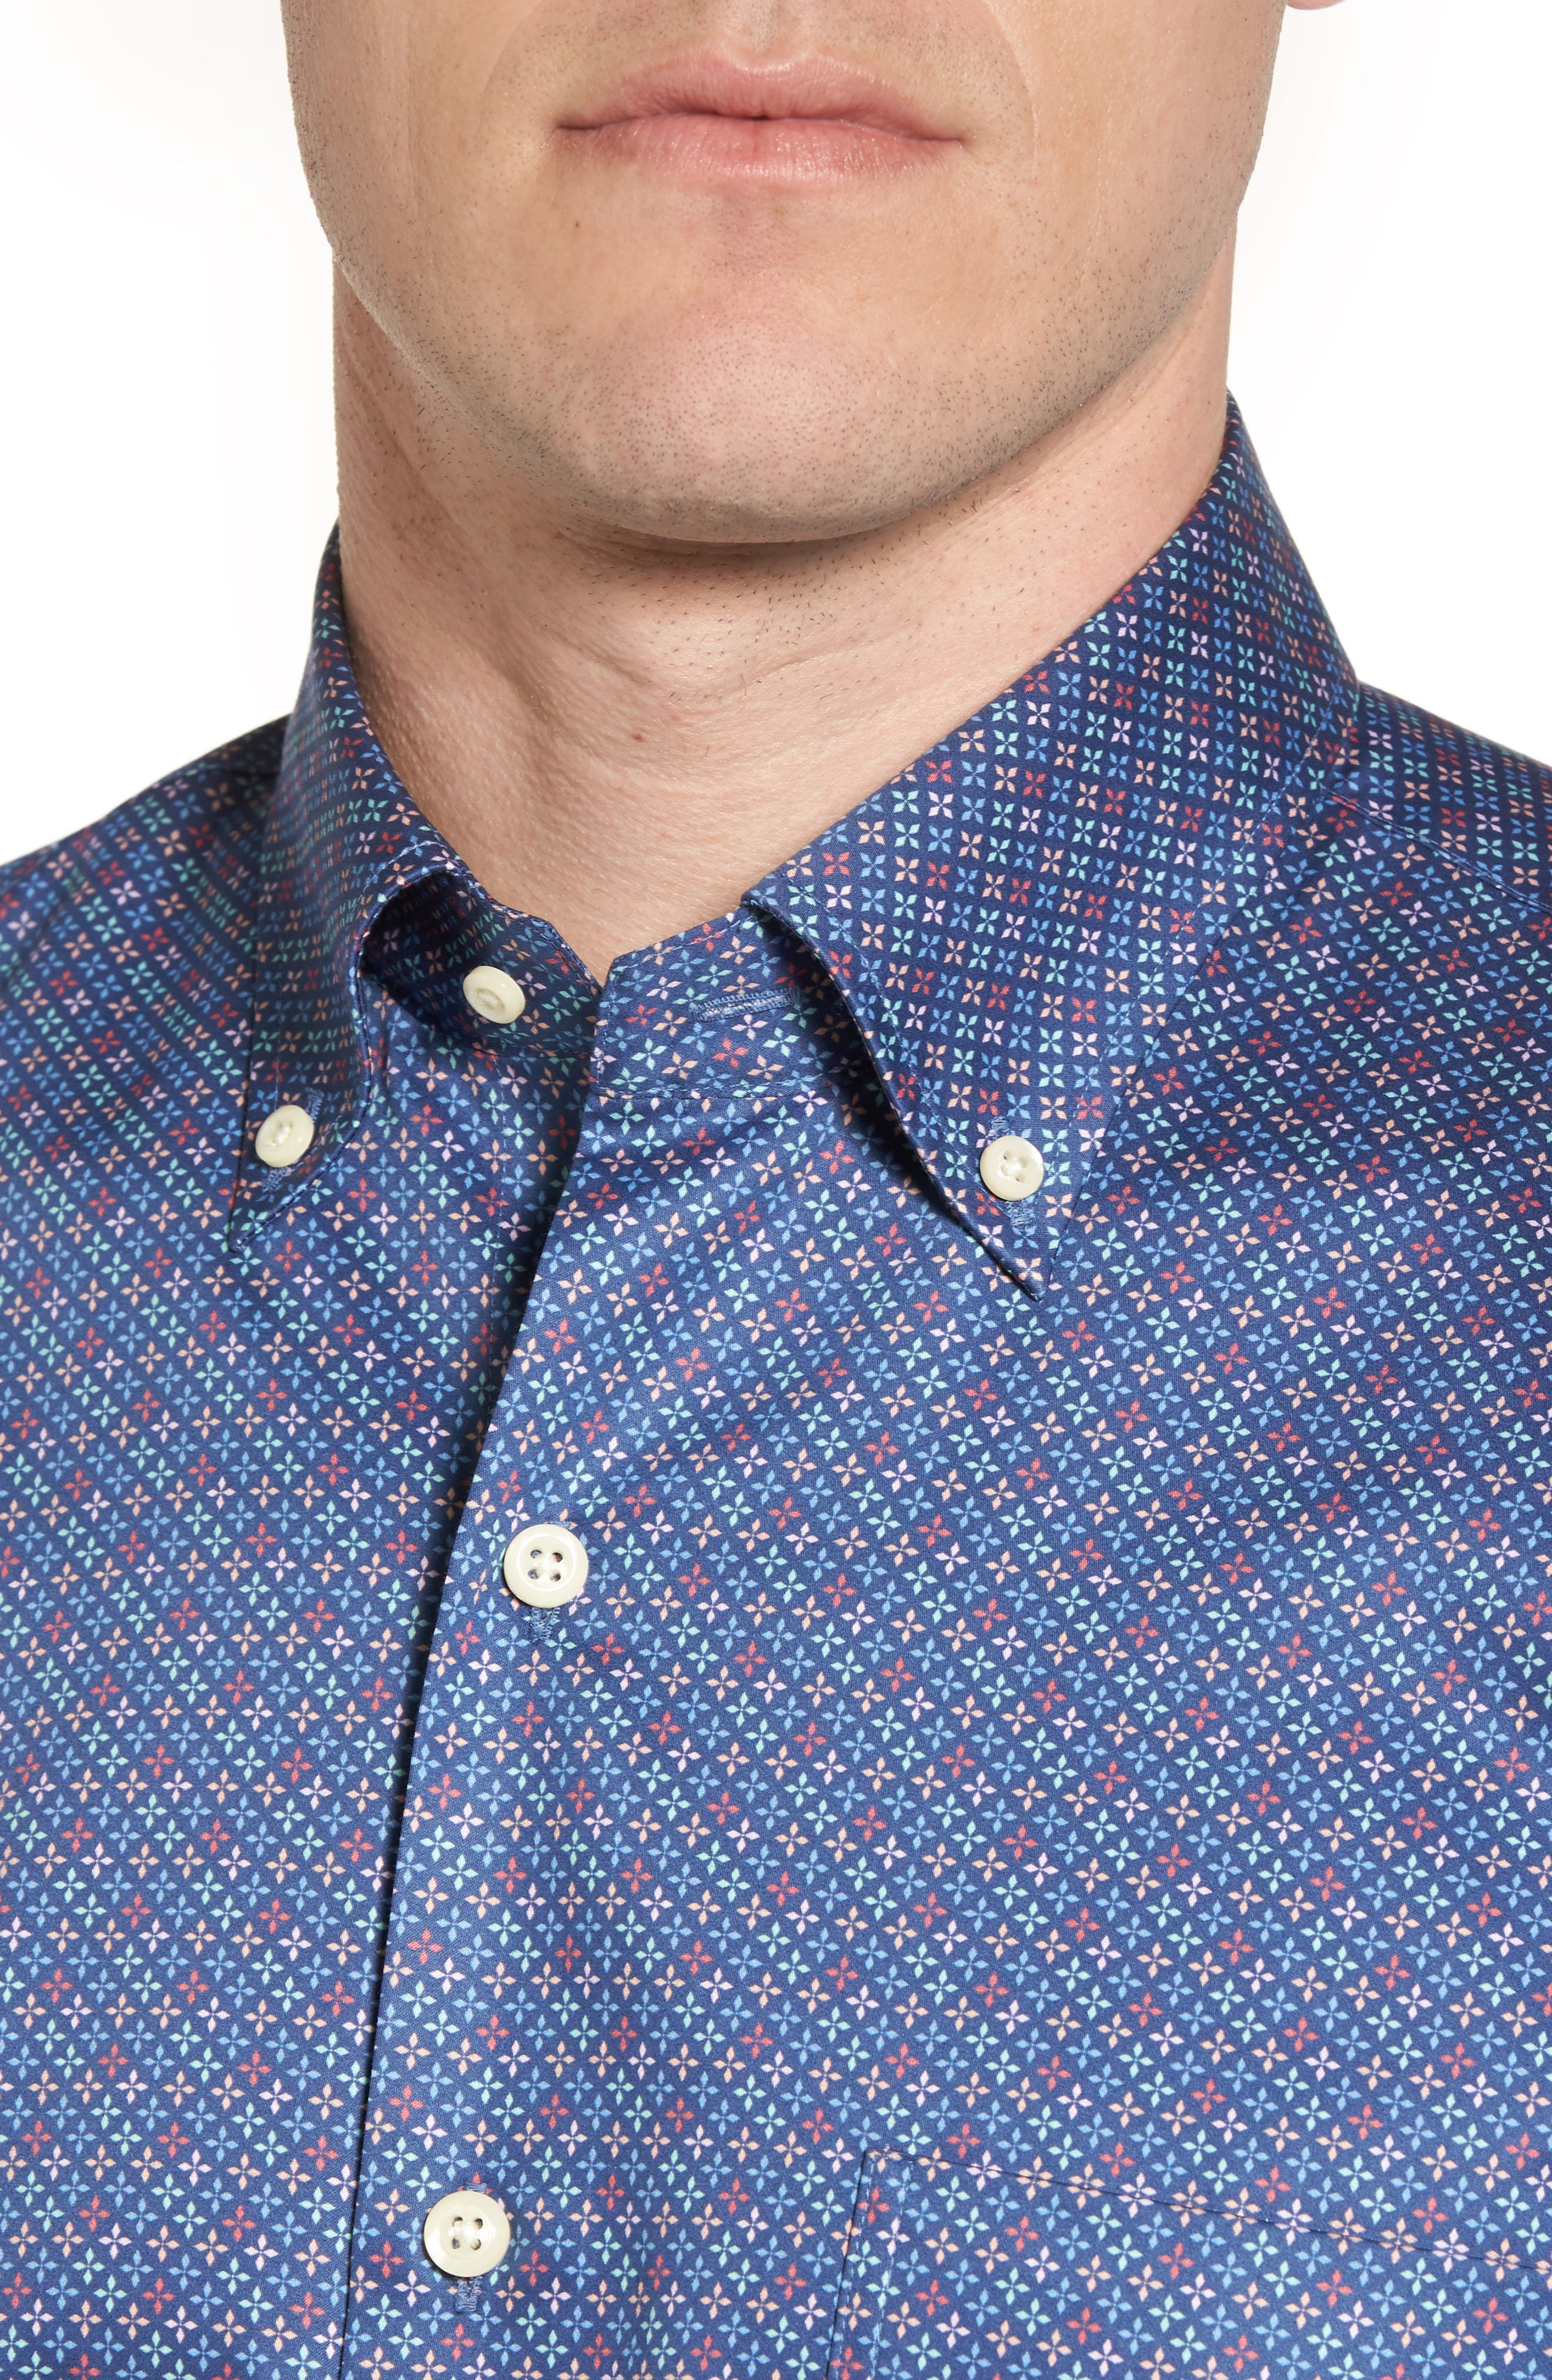 All Aces Regular Fit Sport Shirt,                             Alternate thumbnail 4, color,                             YANKEE BLUE